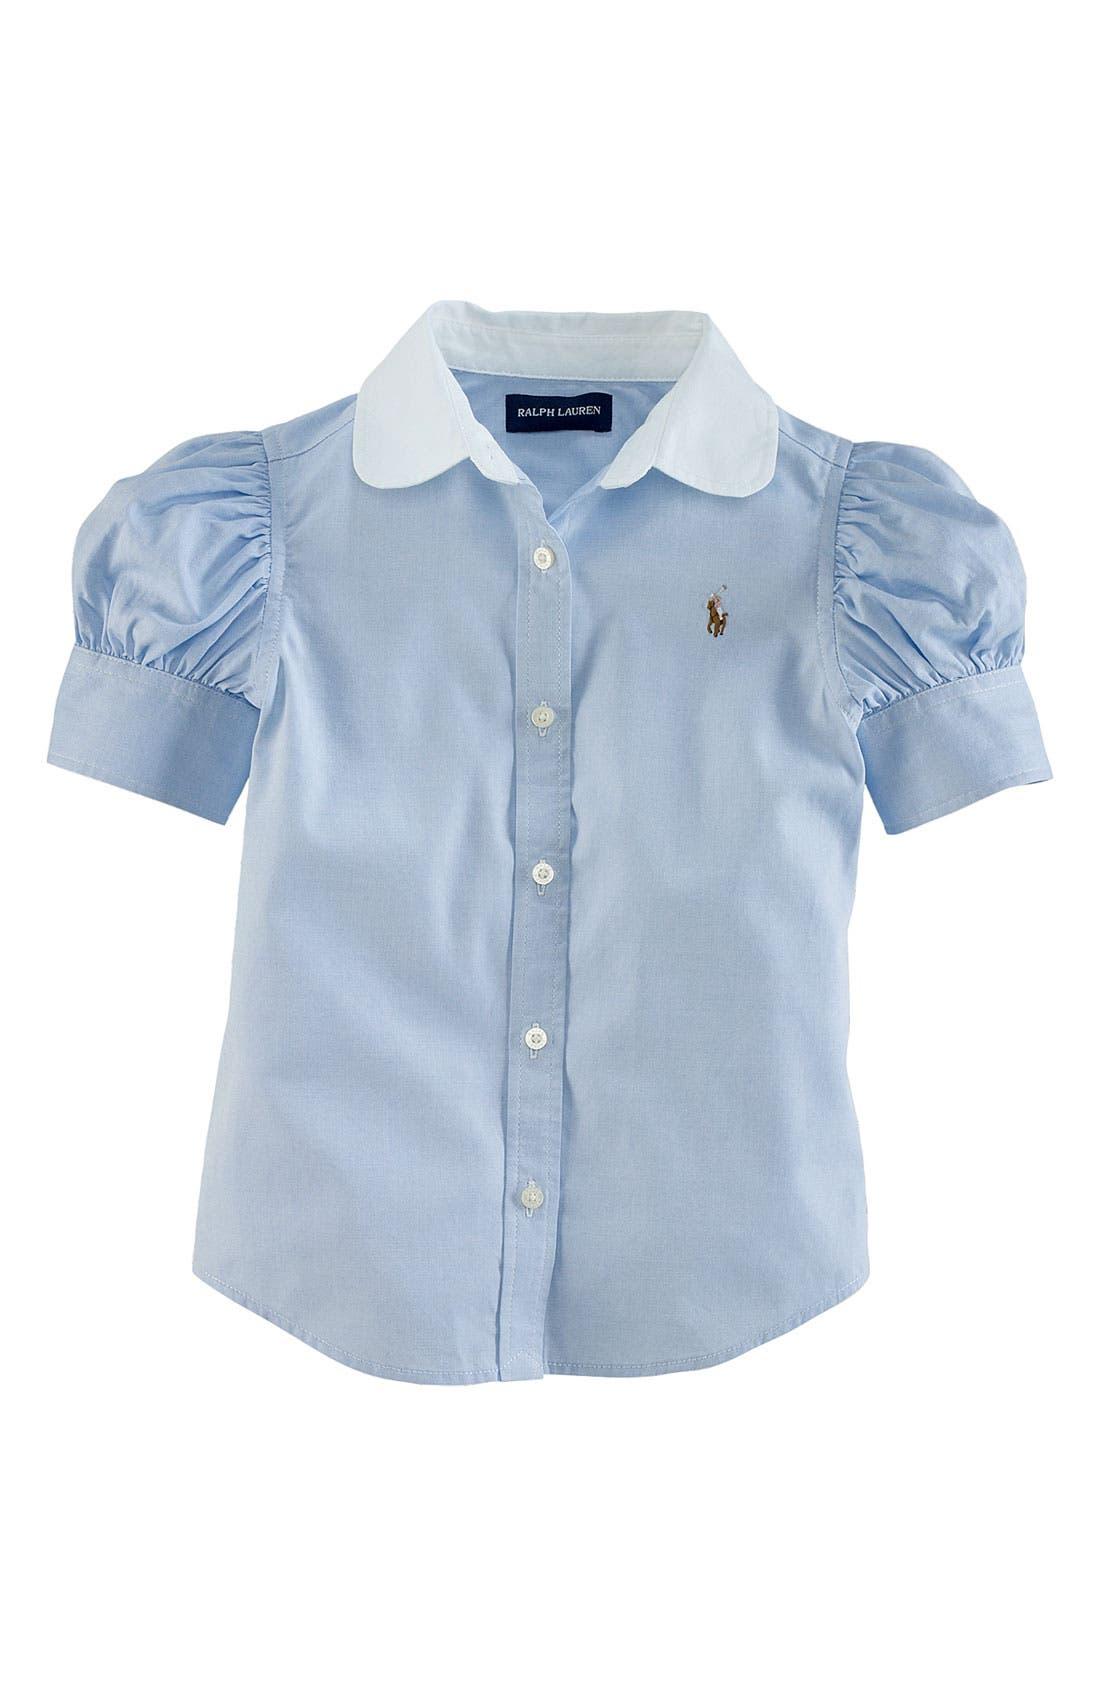 Main Image - Ralph Lauren Pinpoint Oxford Shirt (Toddler)